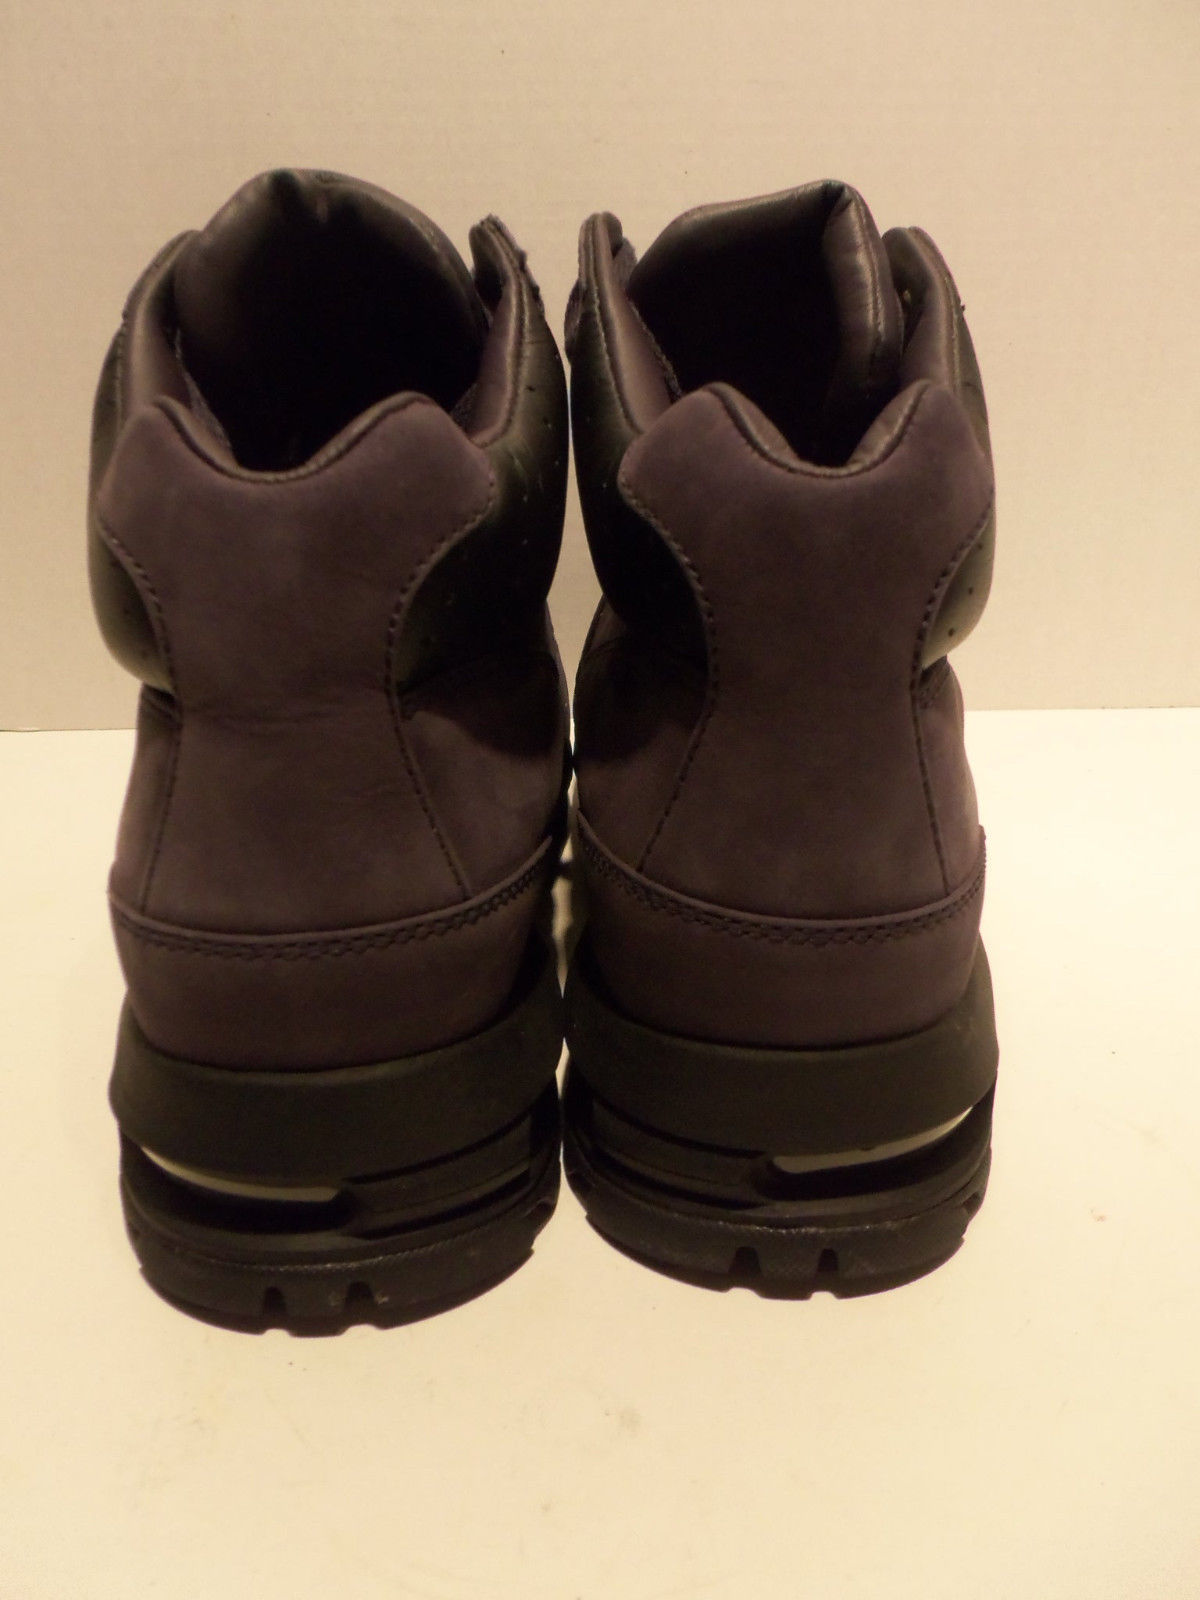 designer fashion 72c91 10a37 Nike Air Max Goadome TT All-Trac ACG Purple Black Boots Shoes Size  13